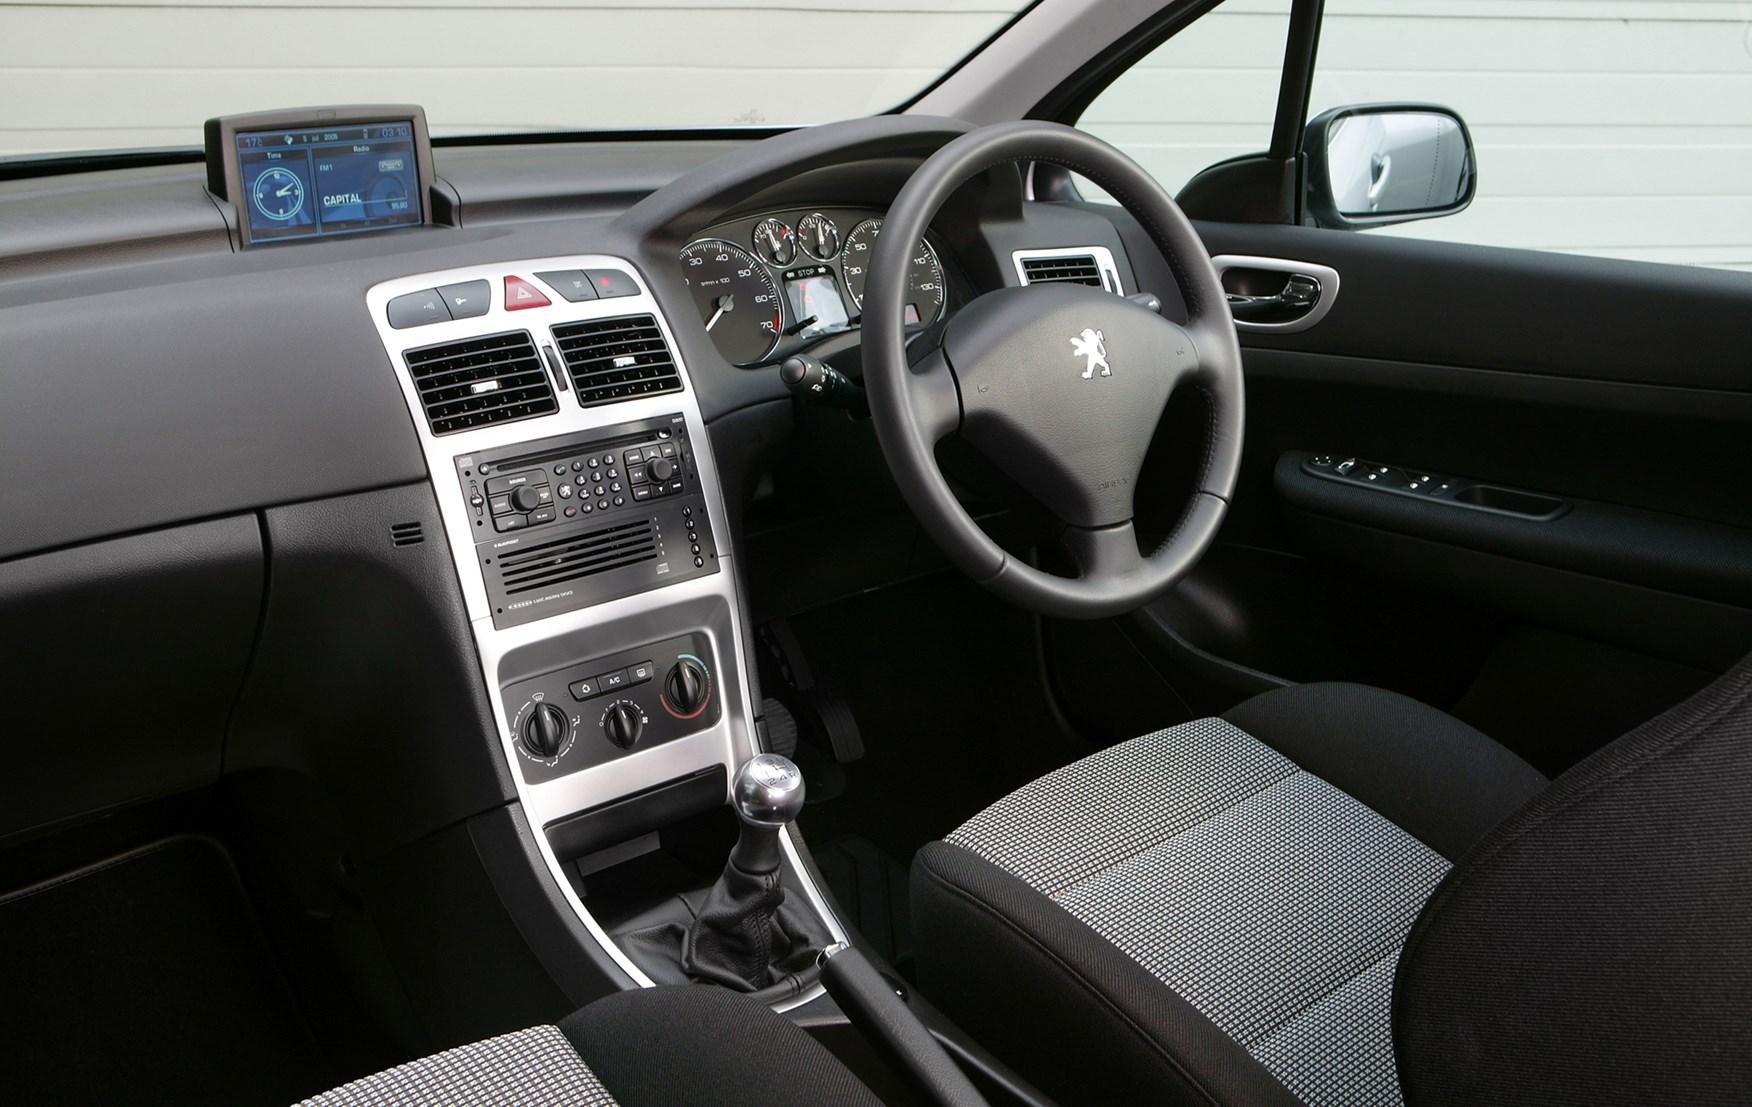 Peugeot 307 Fuse Box For Sale : Peugeot hatchback rivals parkers